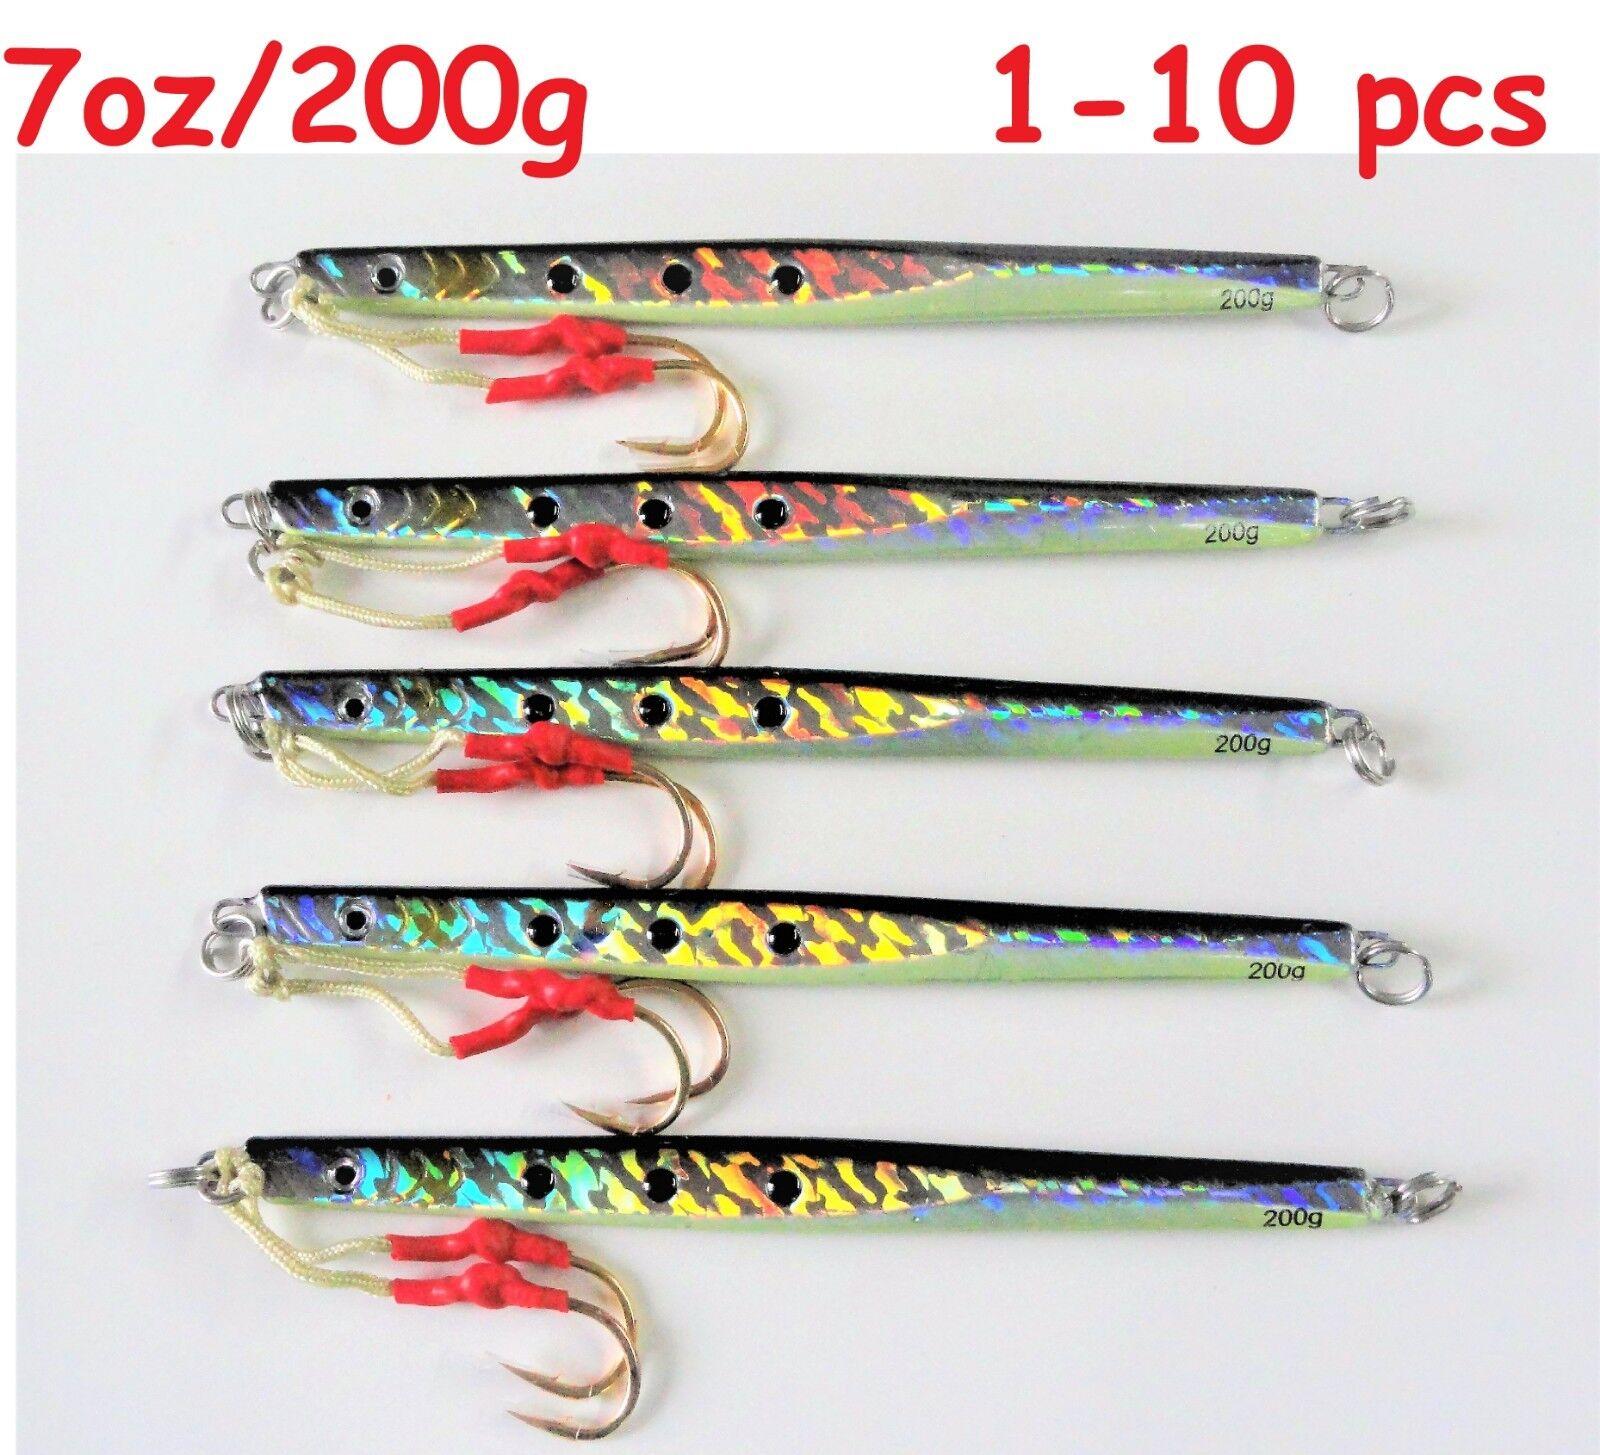 1-10 pcs Speed Jigs 7oz  200g Sardine greenical Knife Butterfly Saltwater Lures